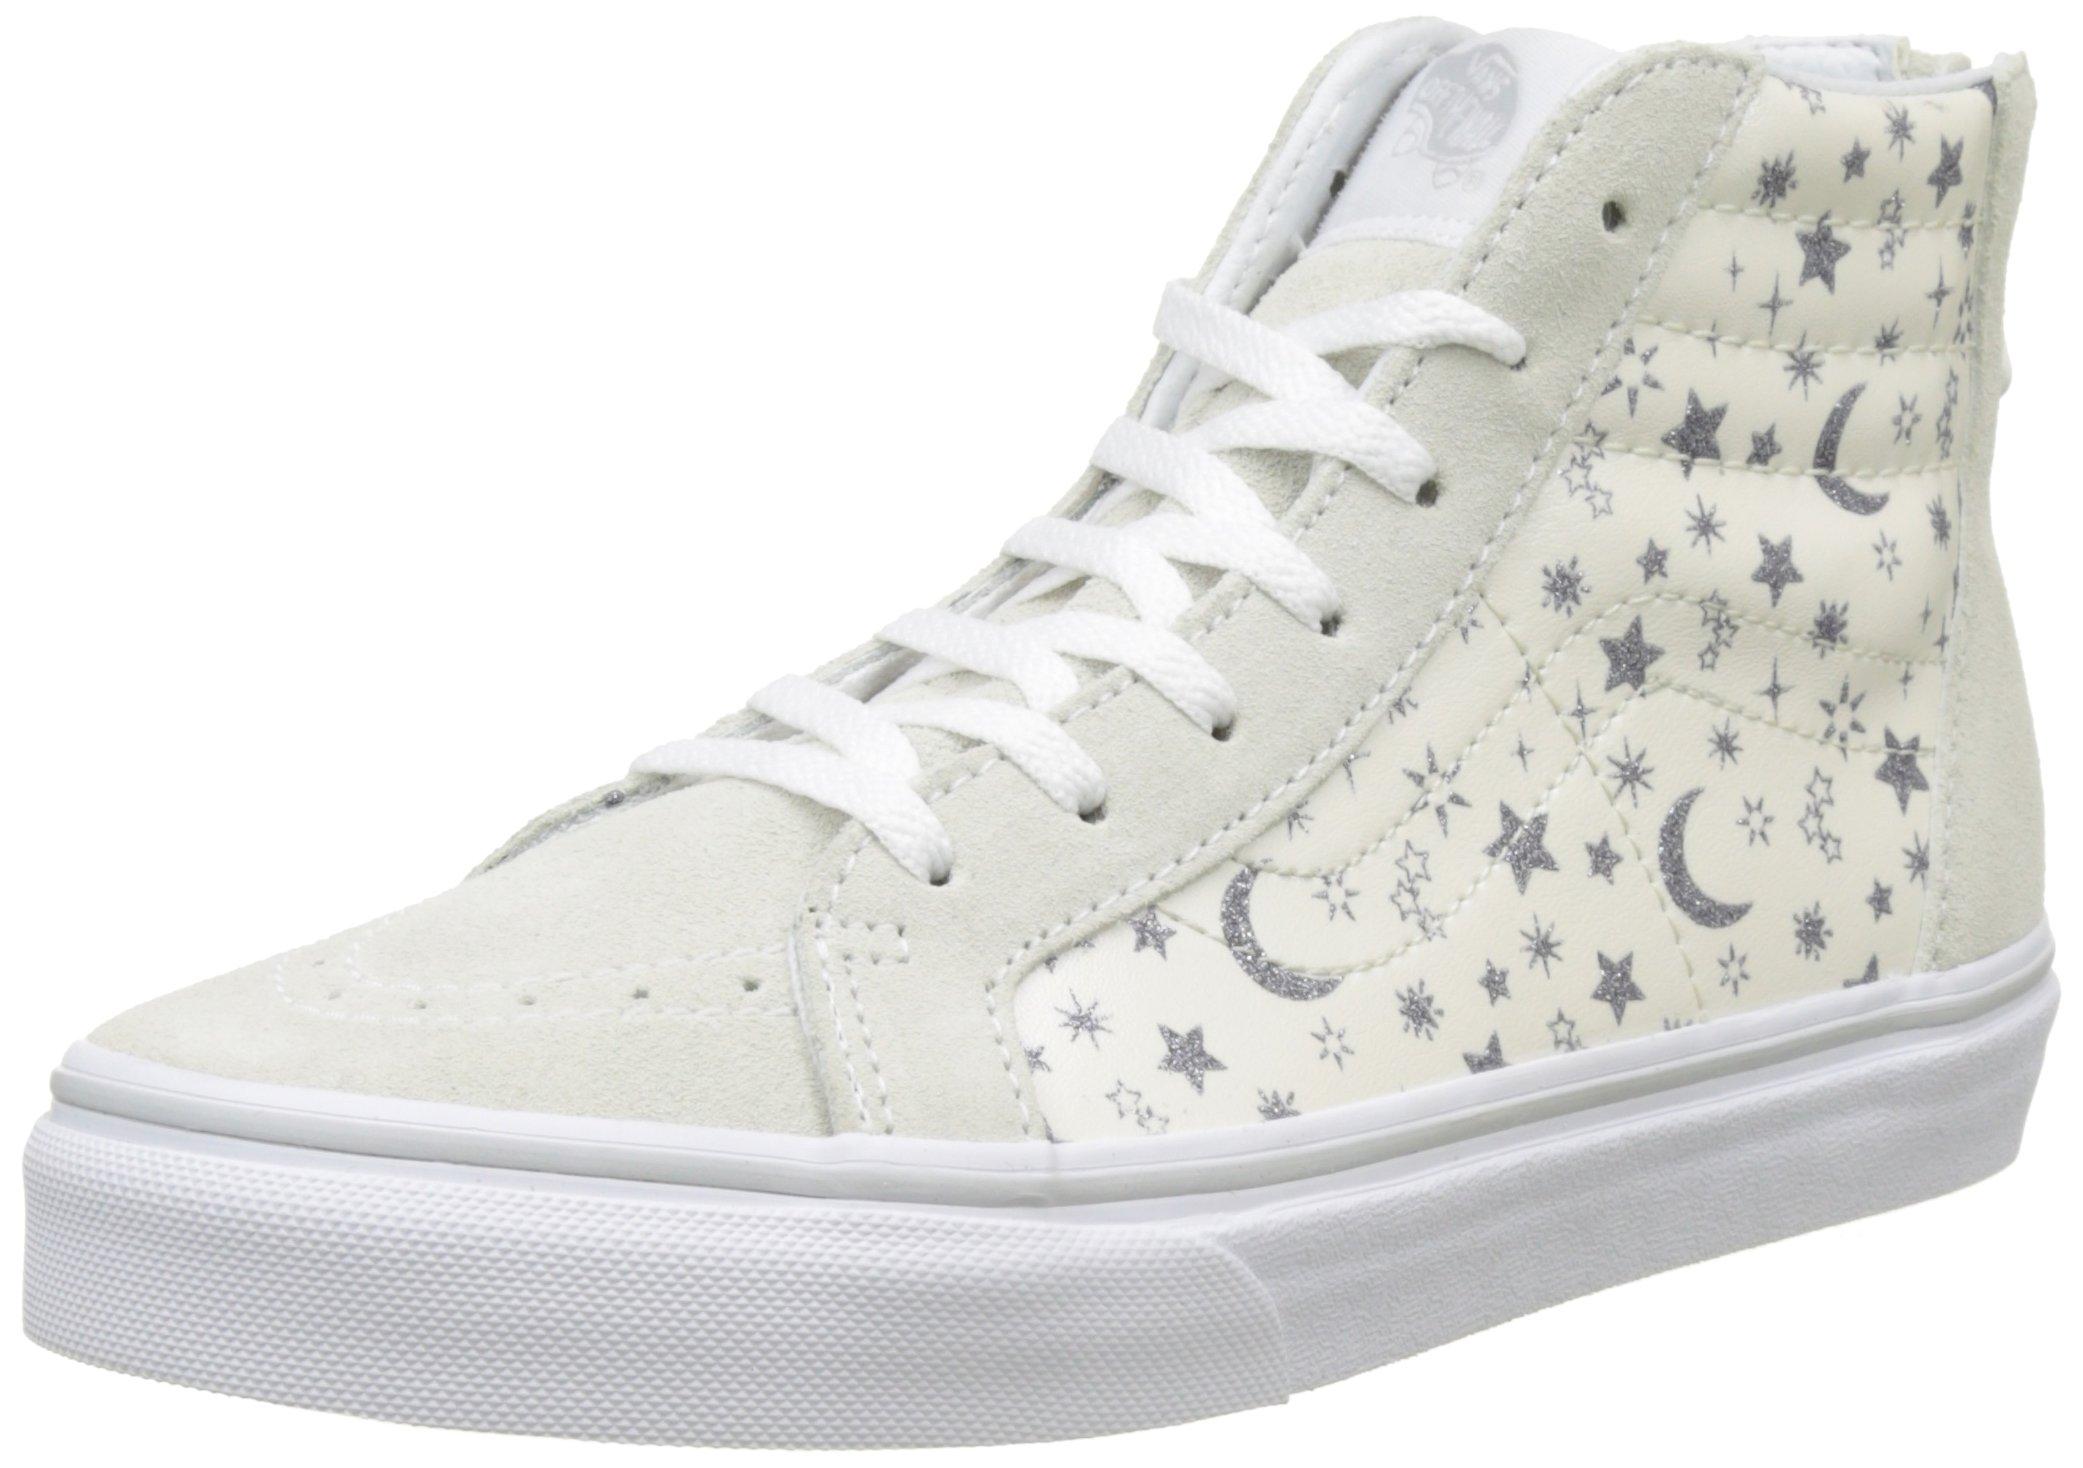 Vans Kids Sk8-Hi Zip (Star Glitter) White Skate Shoe 13.5 Kids US